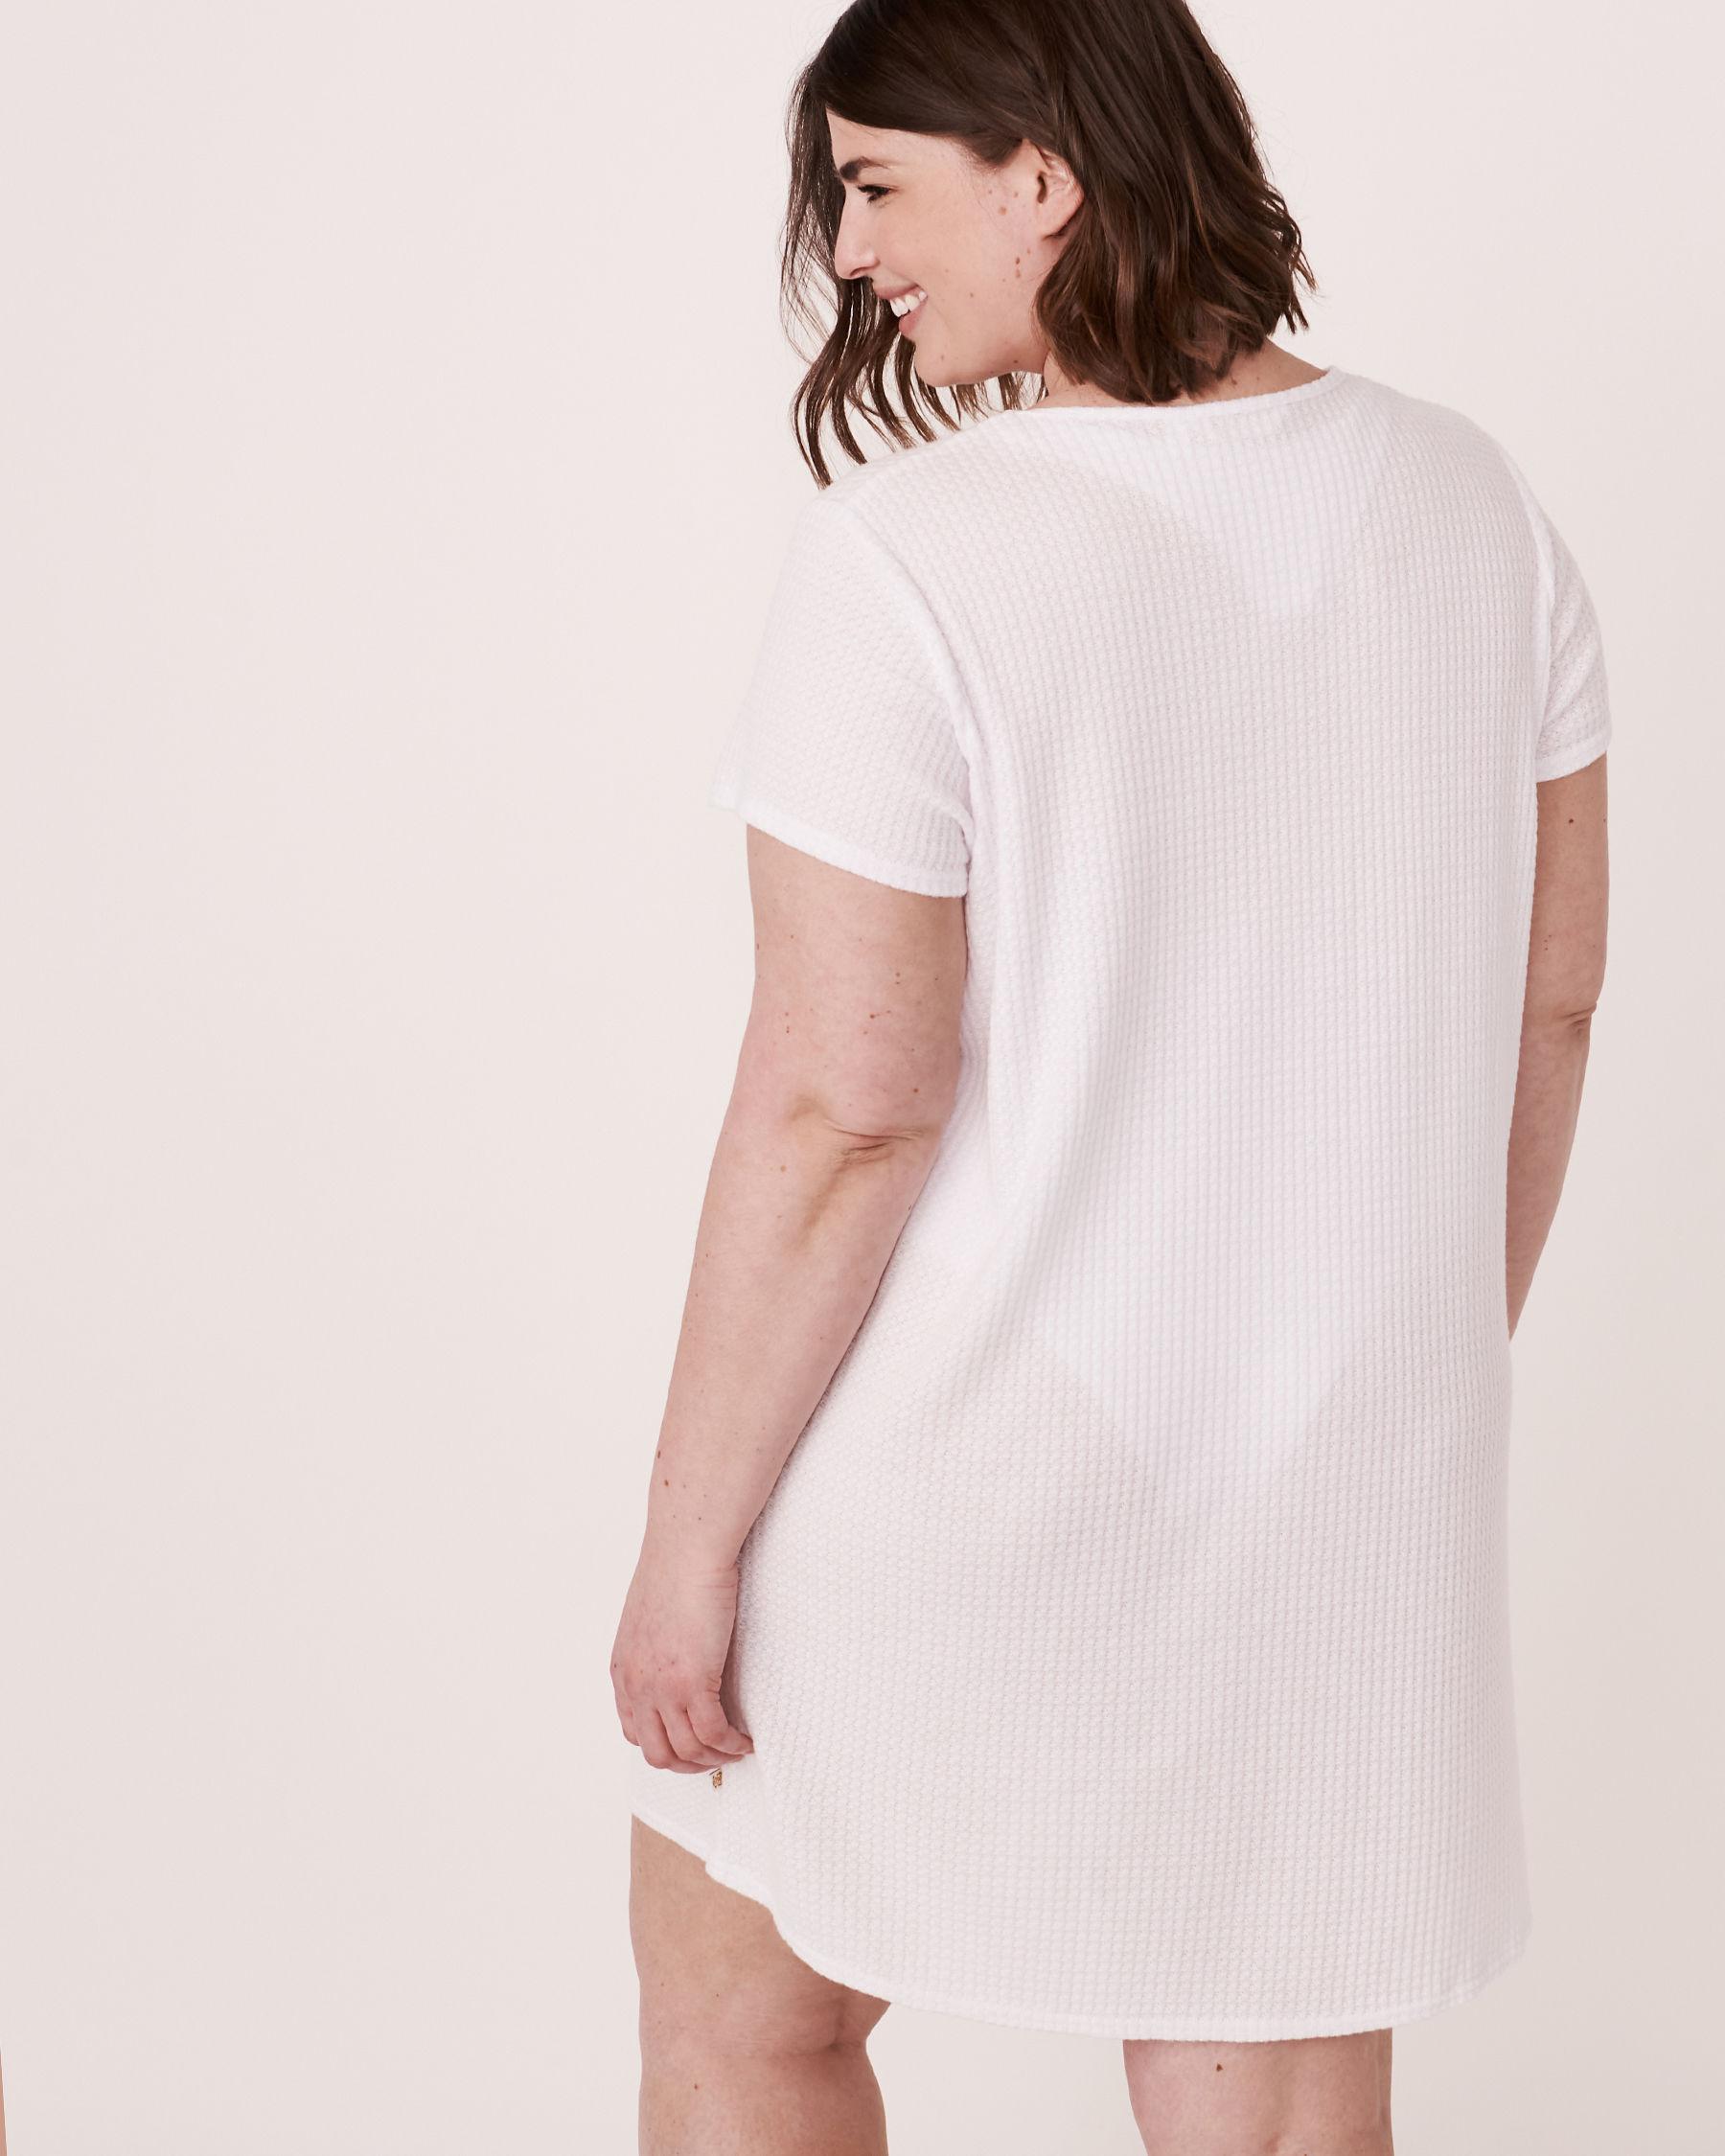 LA VIE EN ROSE AQUA Twisted Short Dress White 80300017 - View2